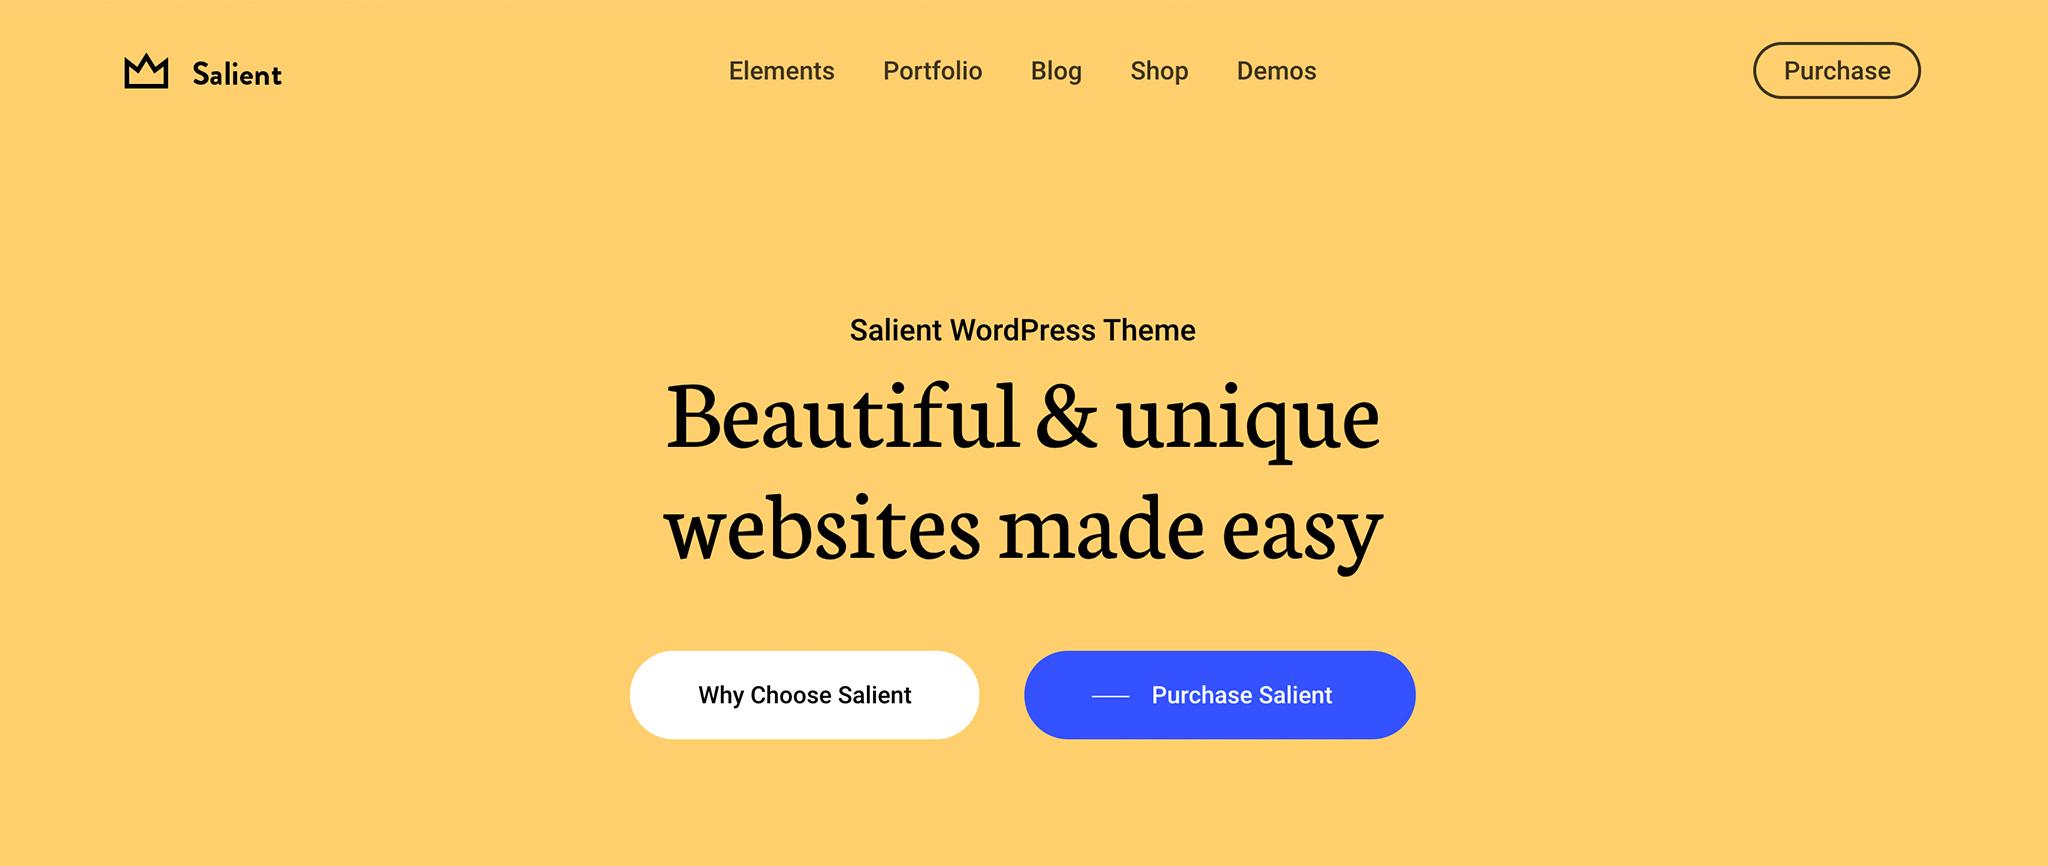 Salient Premium WordPress Theme